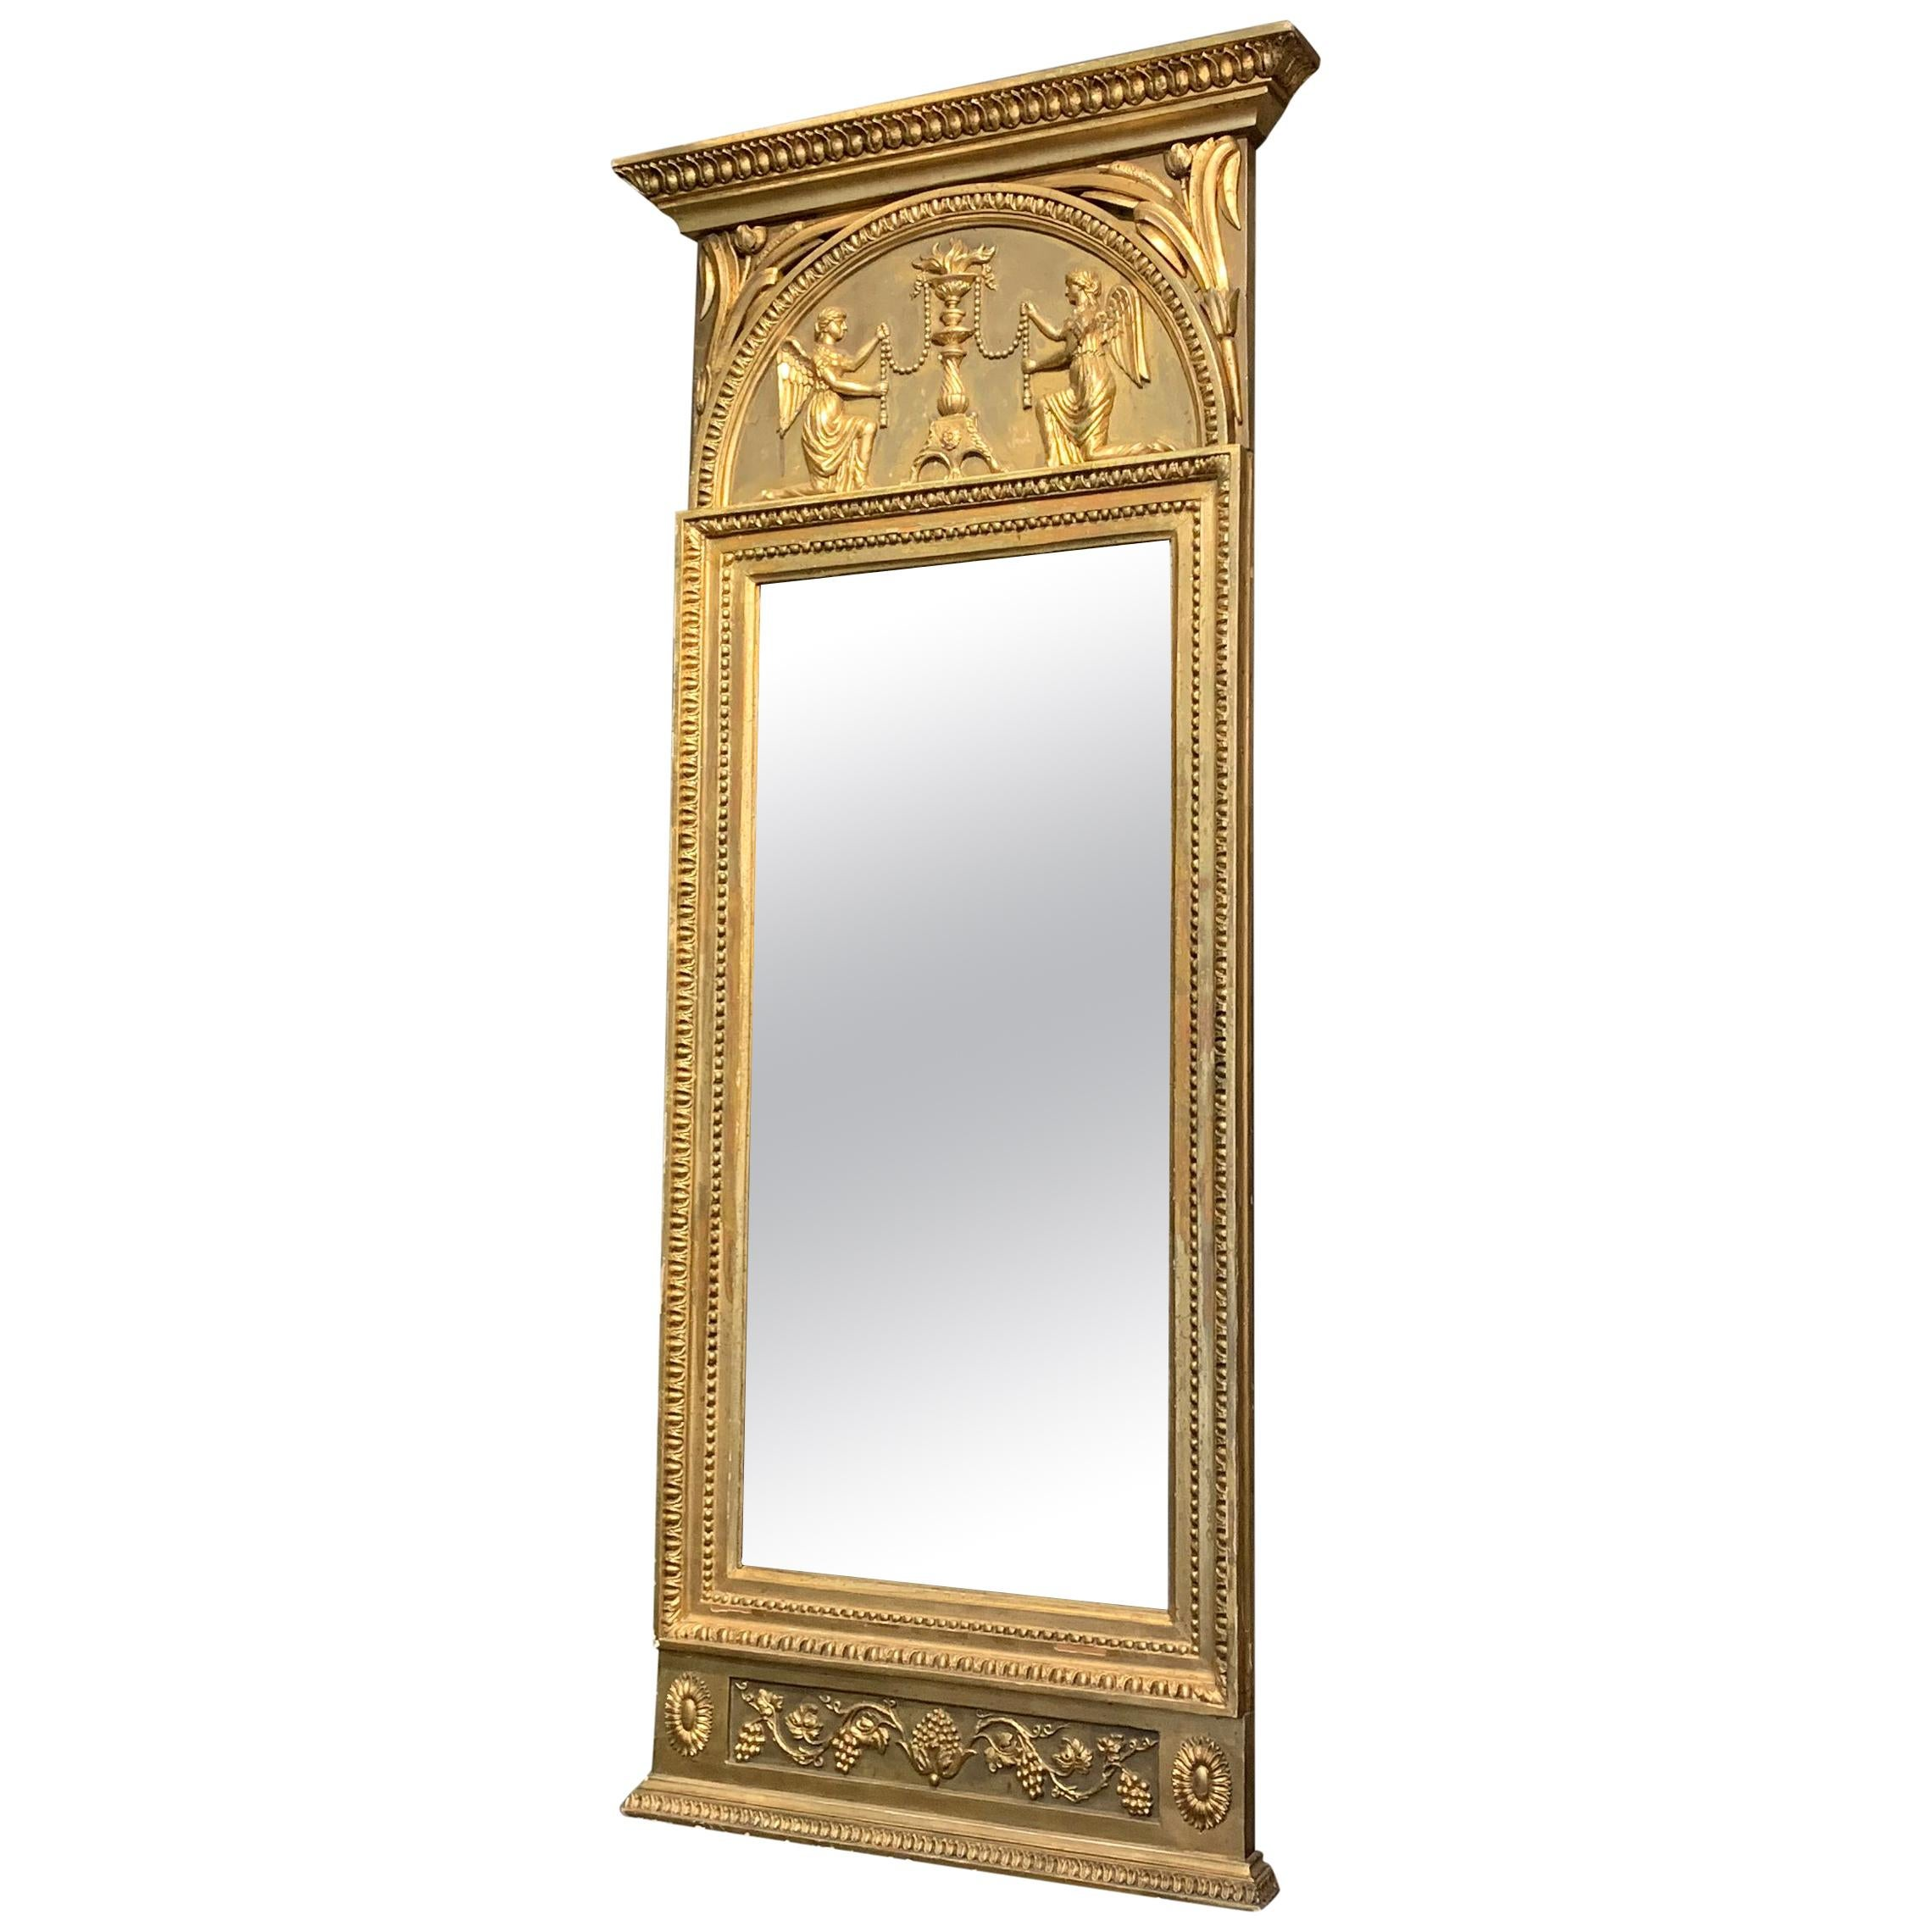 19th Century Swedish Gustavian Gilded Wood Wall Mirror